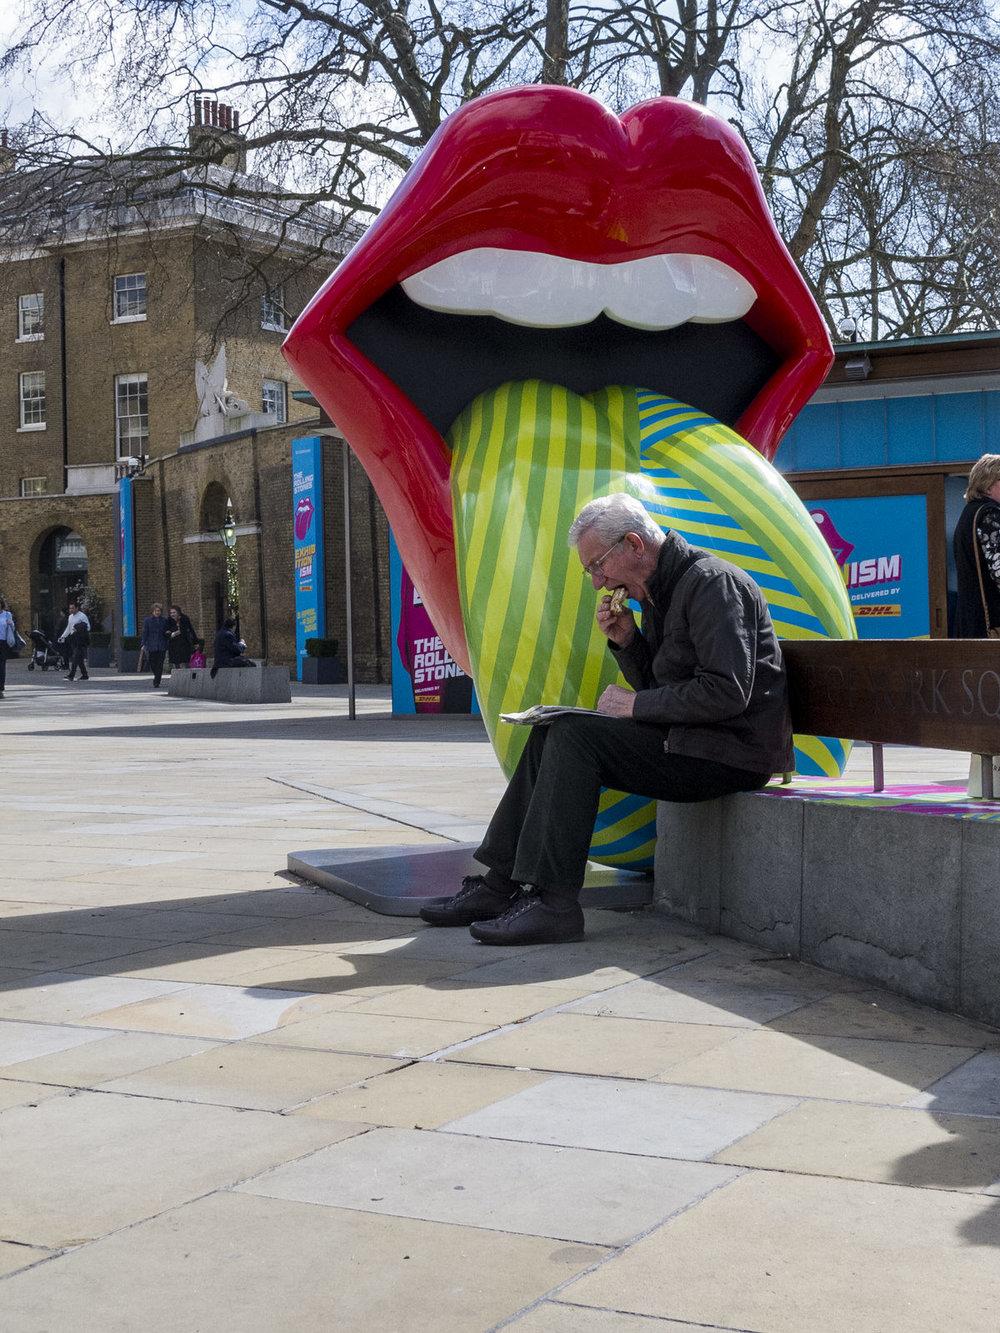 Rolling Stones Exhiition.jpg